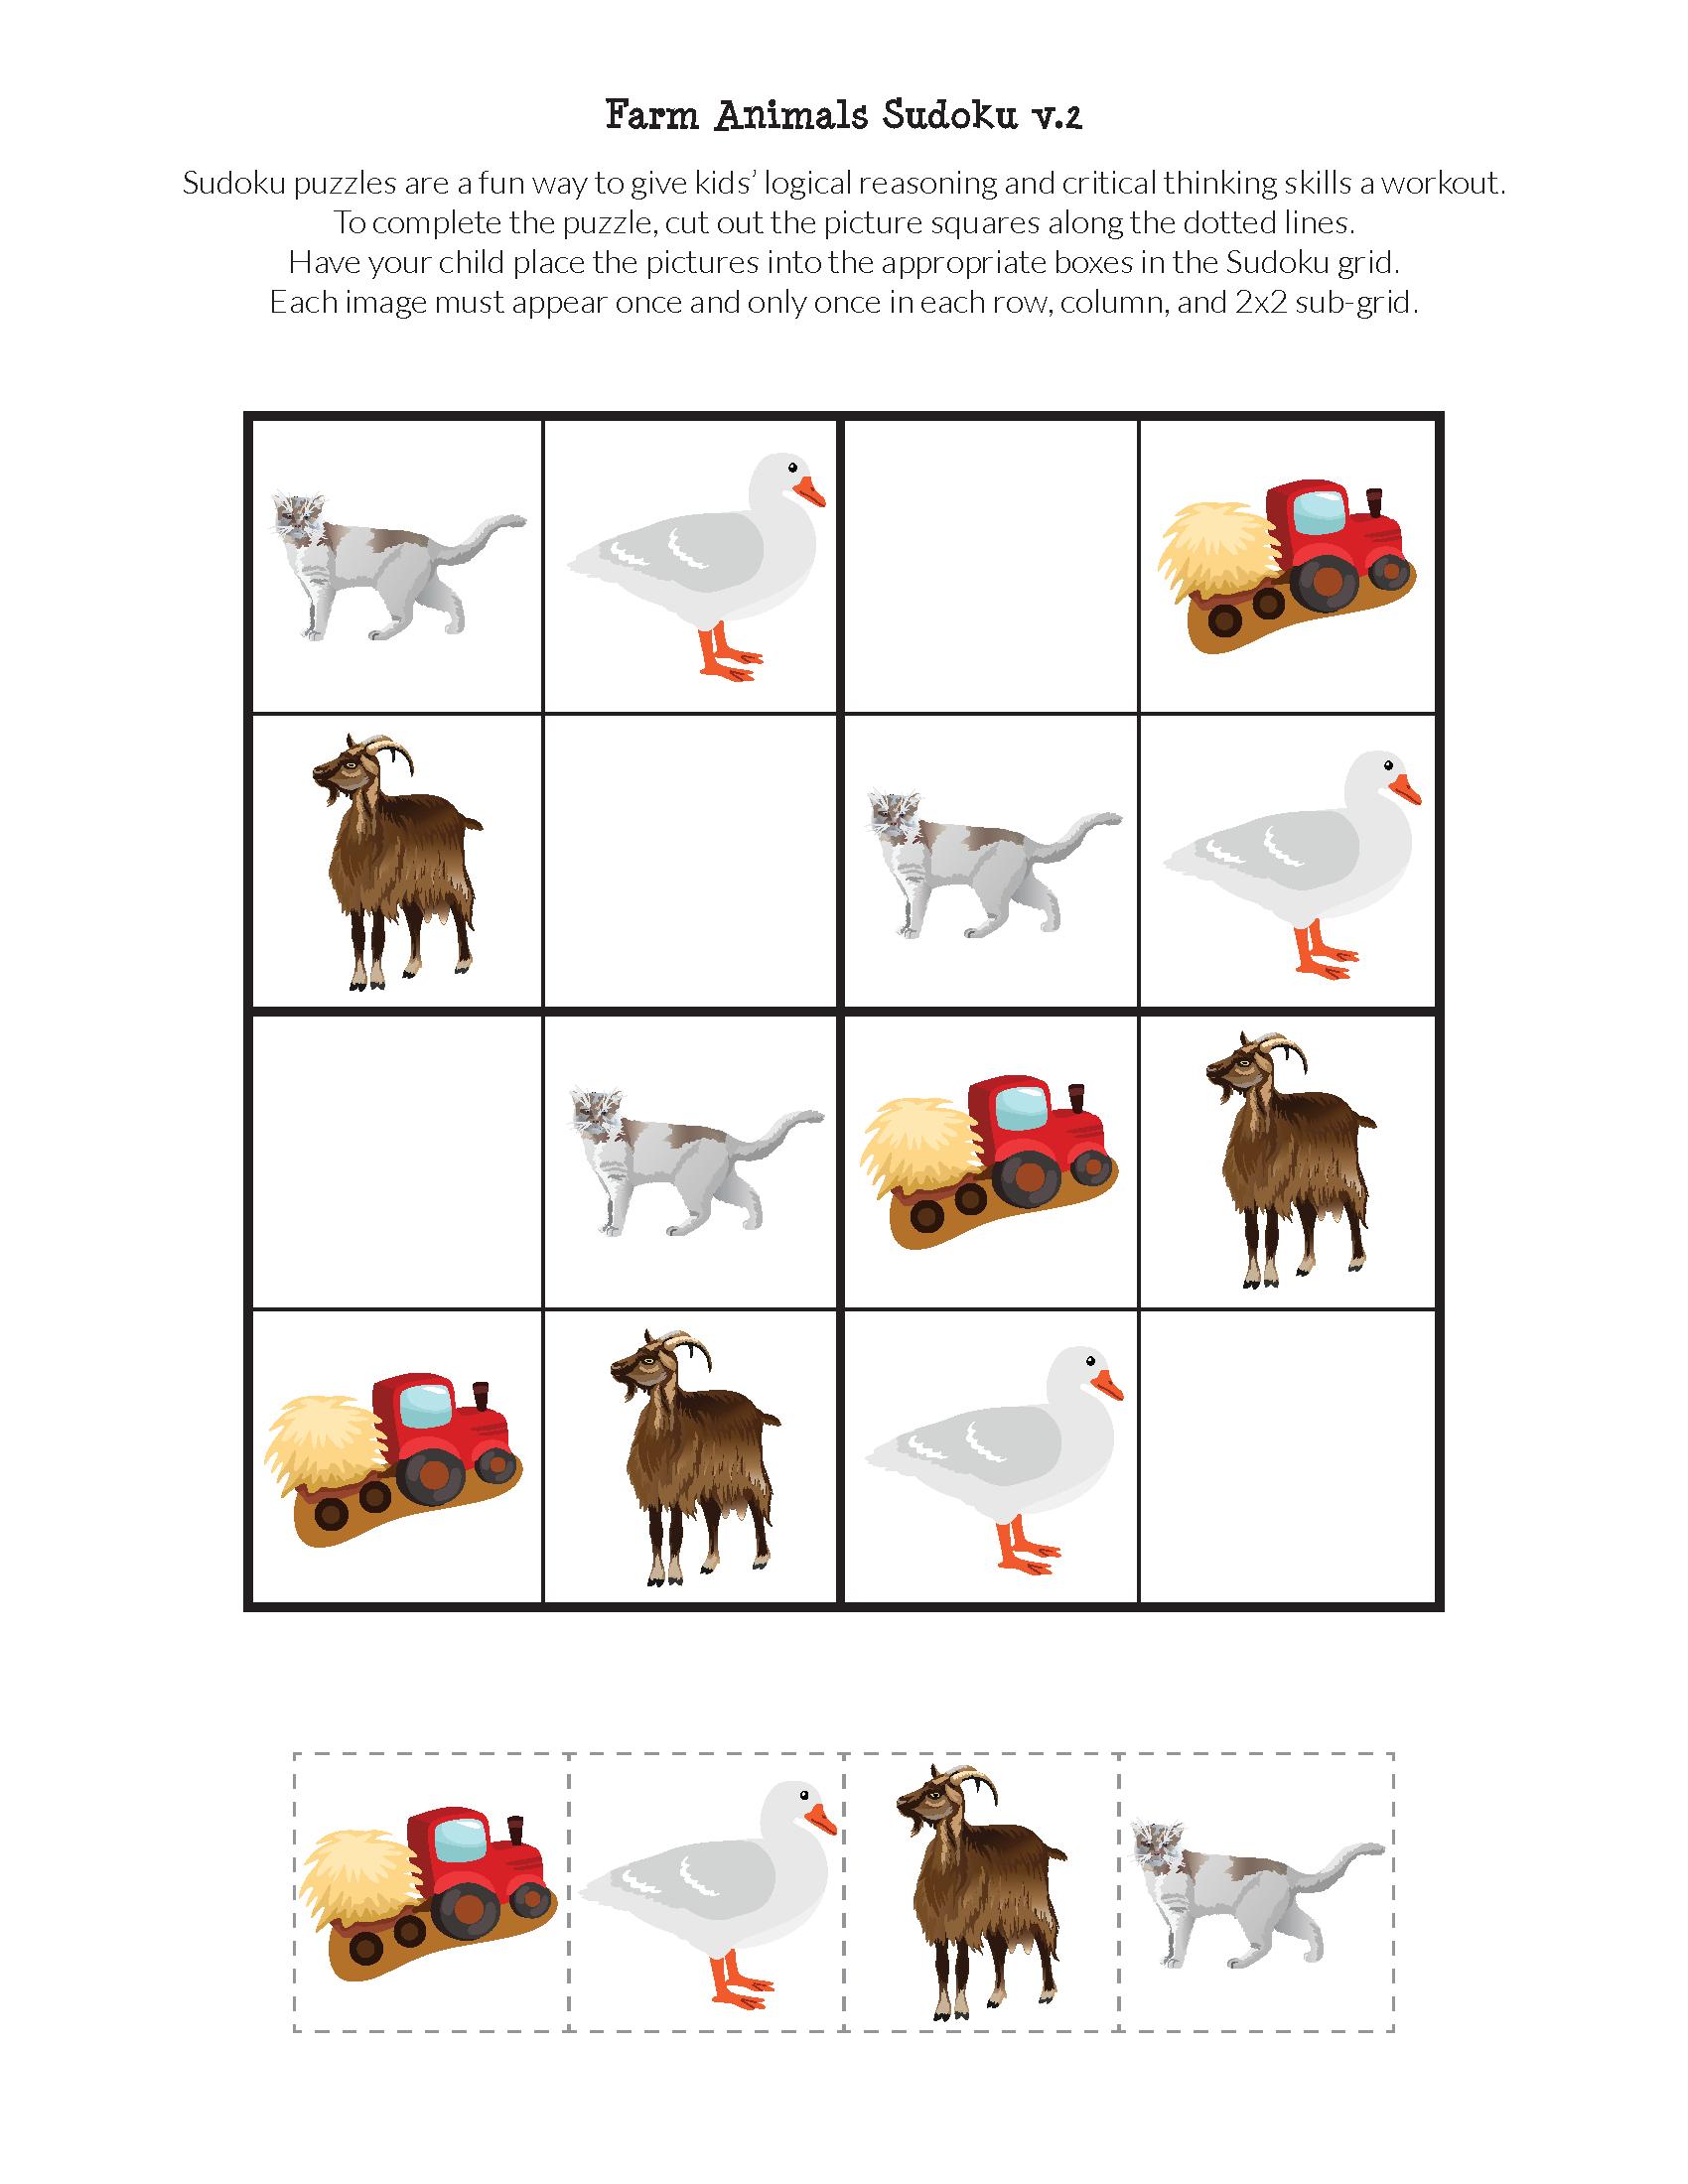 Farm Animals Sudoku Puzzles {Free Printables} - Gift Of Curiosity - Free Printable Animal Puzzles